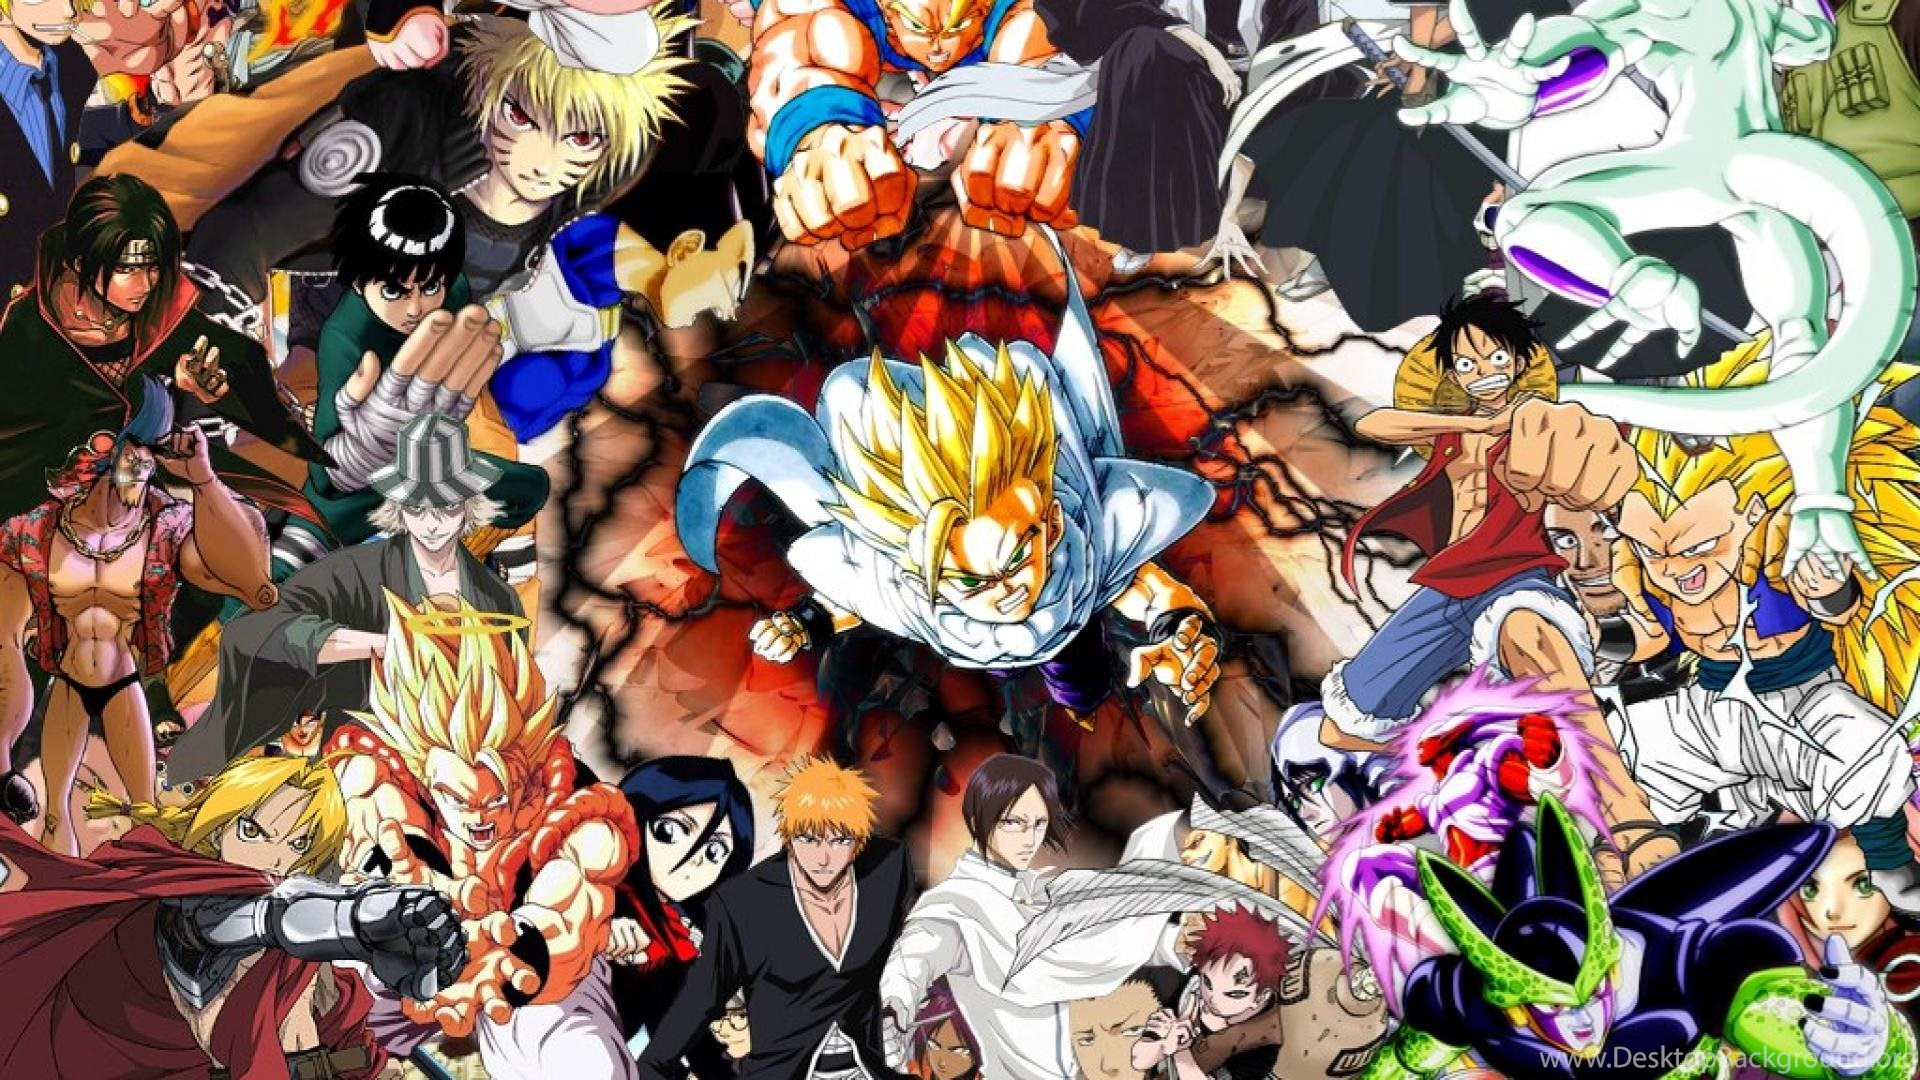 Great Wallpaper Naruto Dbz - 717473_wallpapers-one-piece-dbz-naruto-fma_1920x1080_h  Pic_511006.jpg